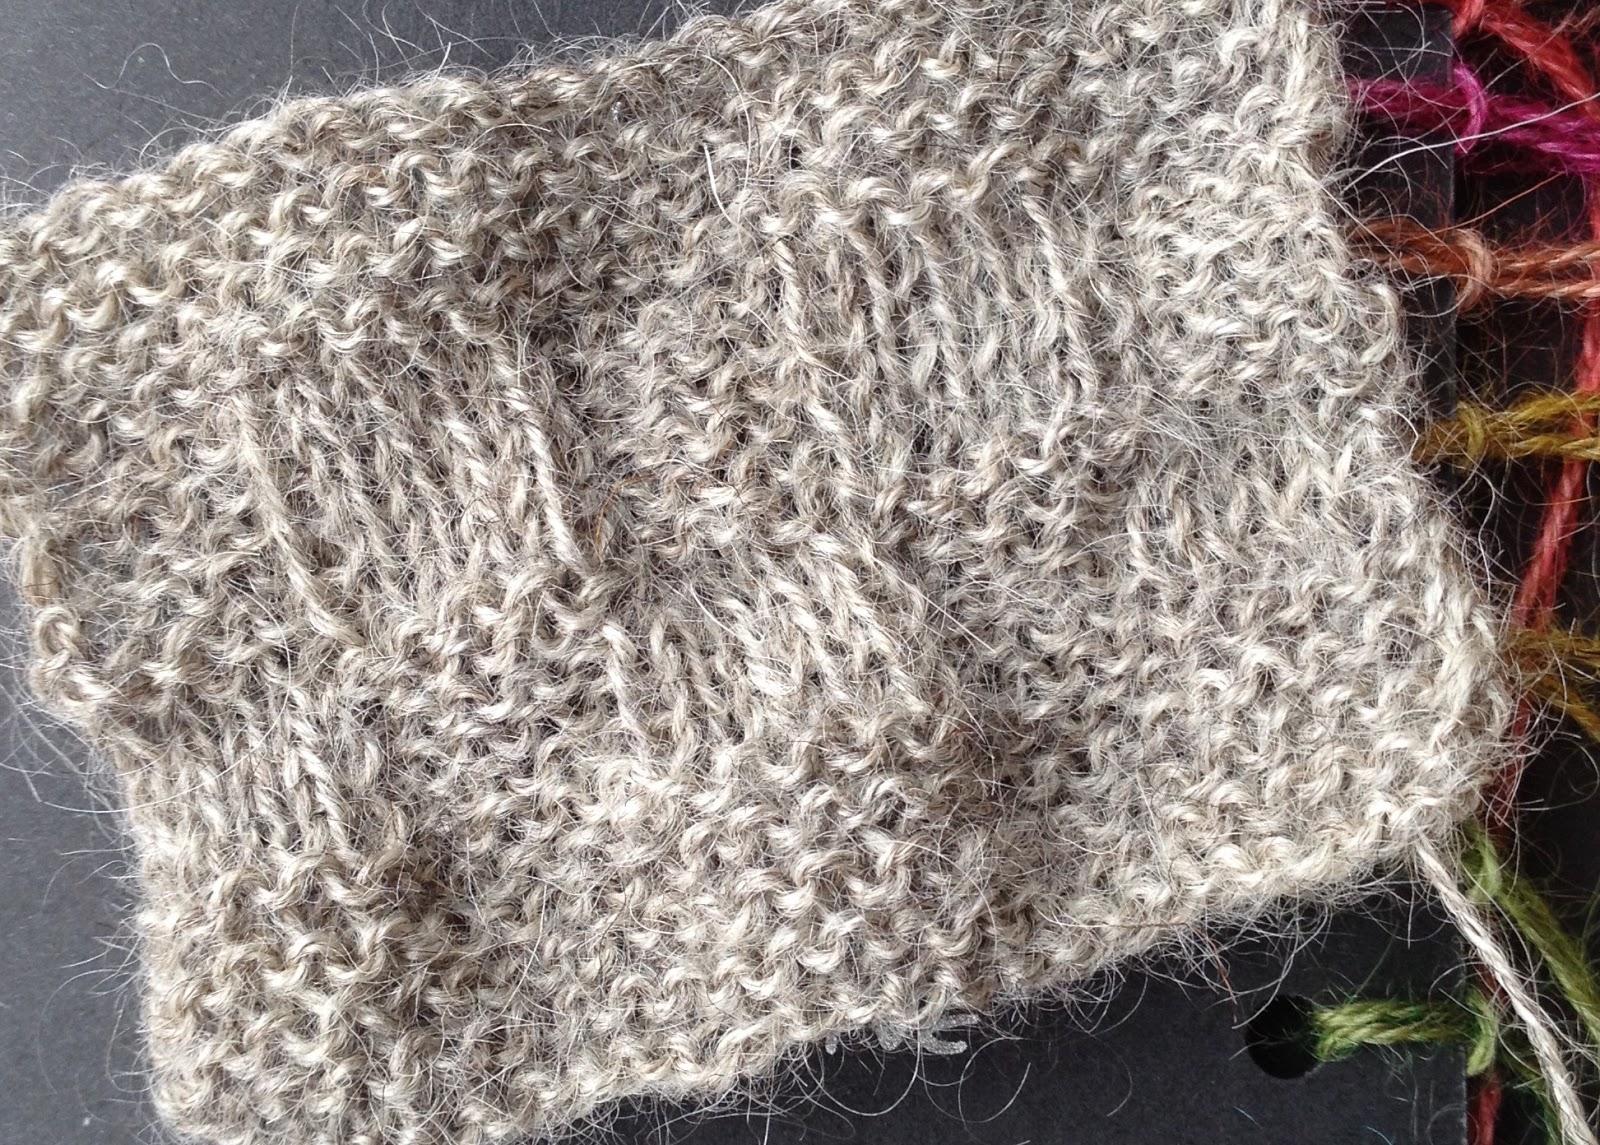 Knitting Goddess : Brityarn a new hand dyed yarn from the knitting goddess